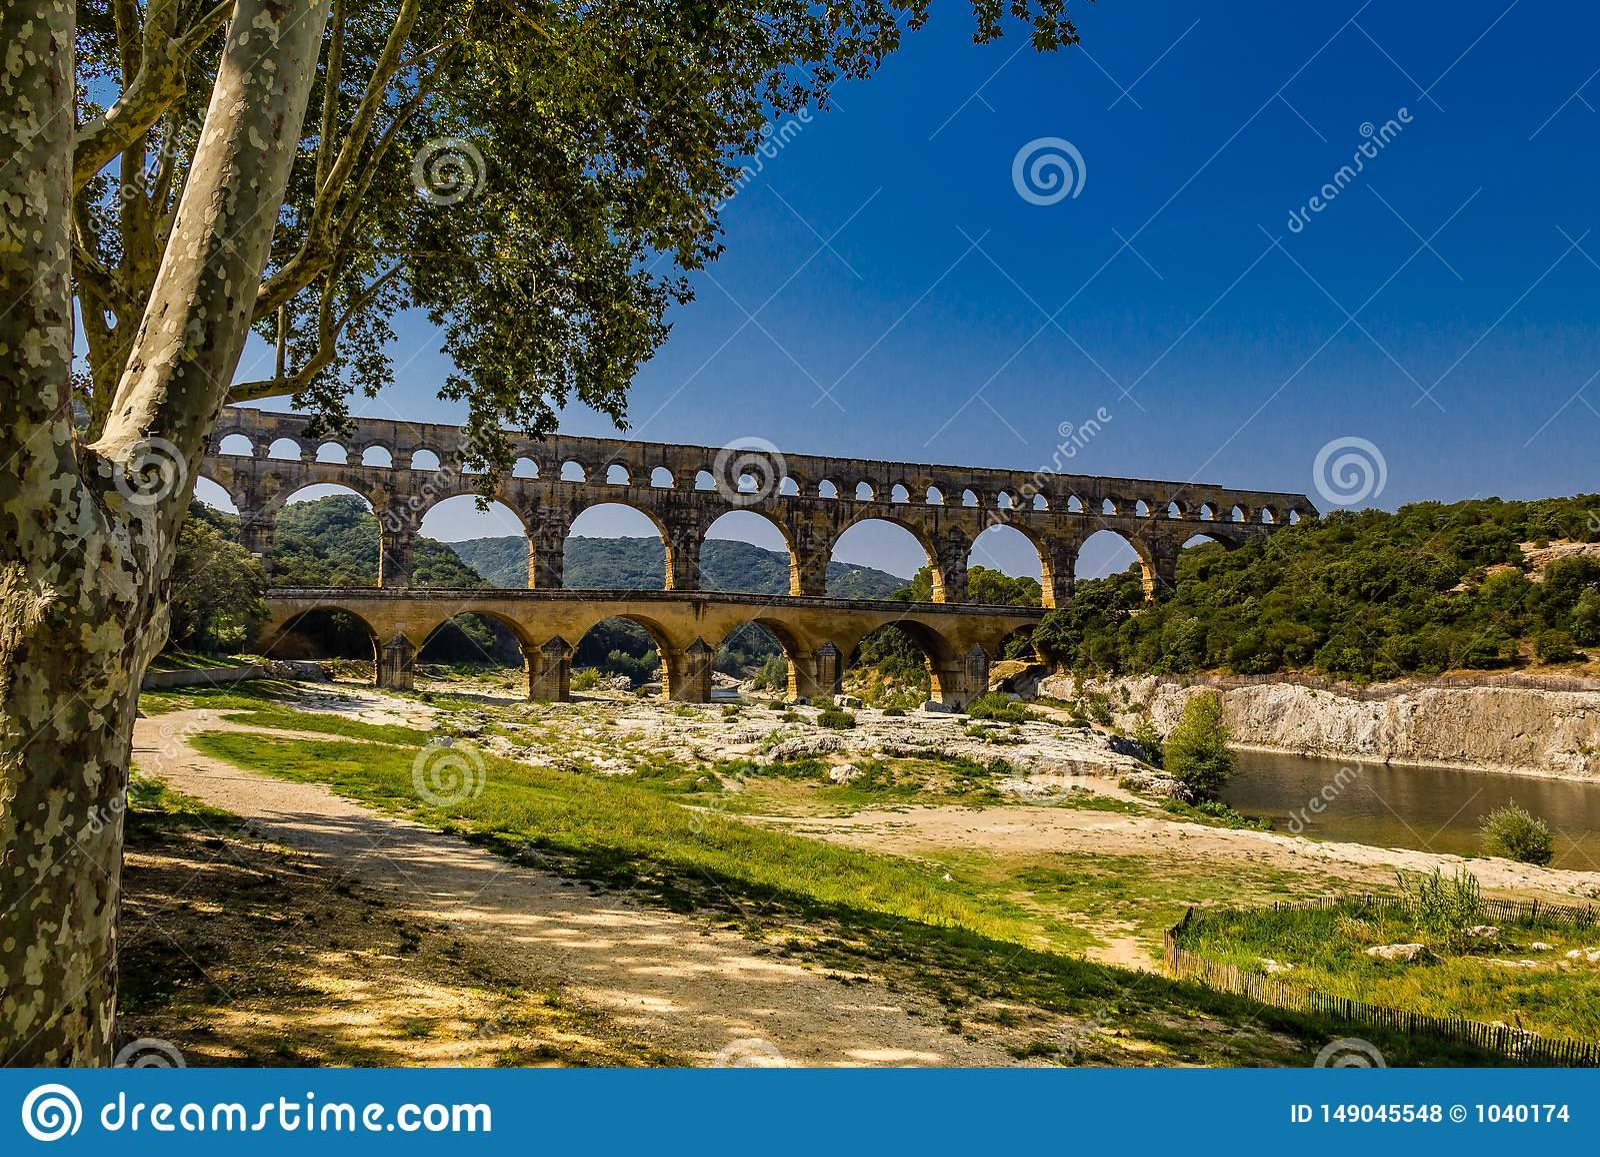 Pont du加尔省,南法国,gardon河好的射击